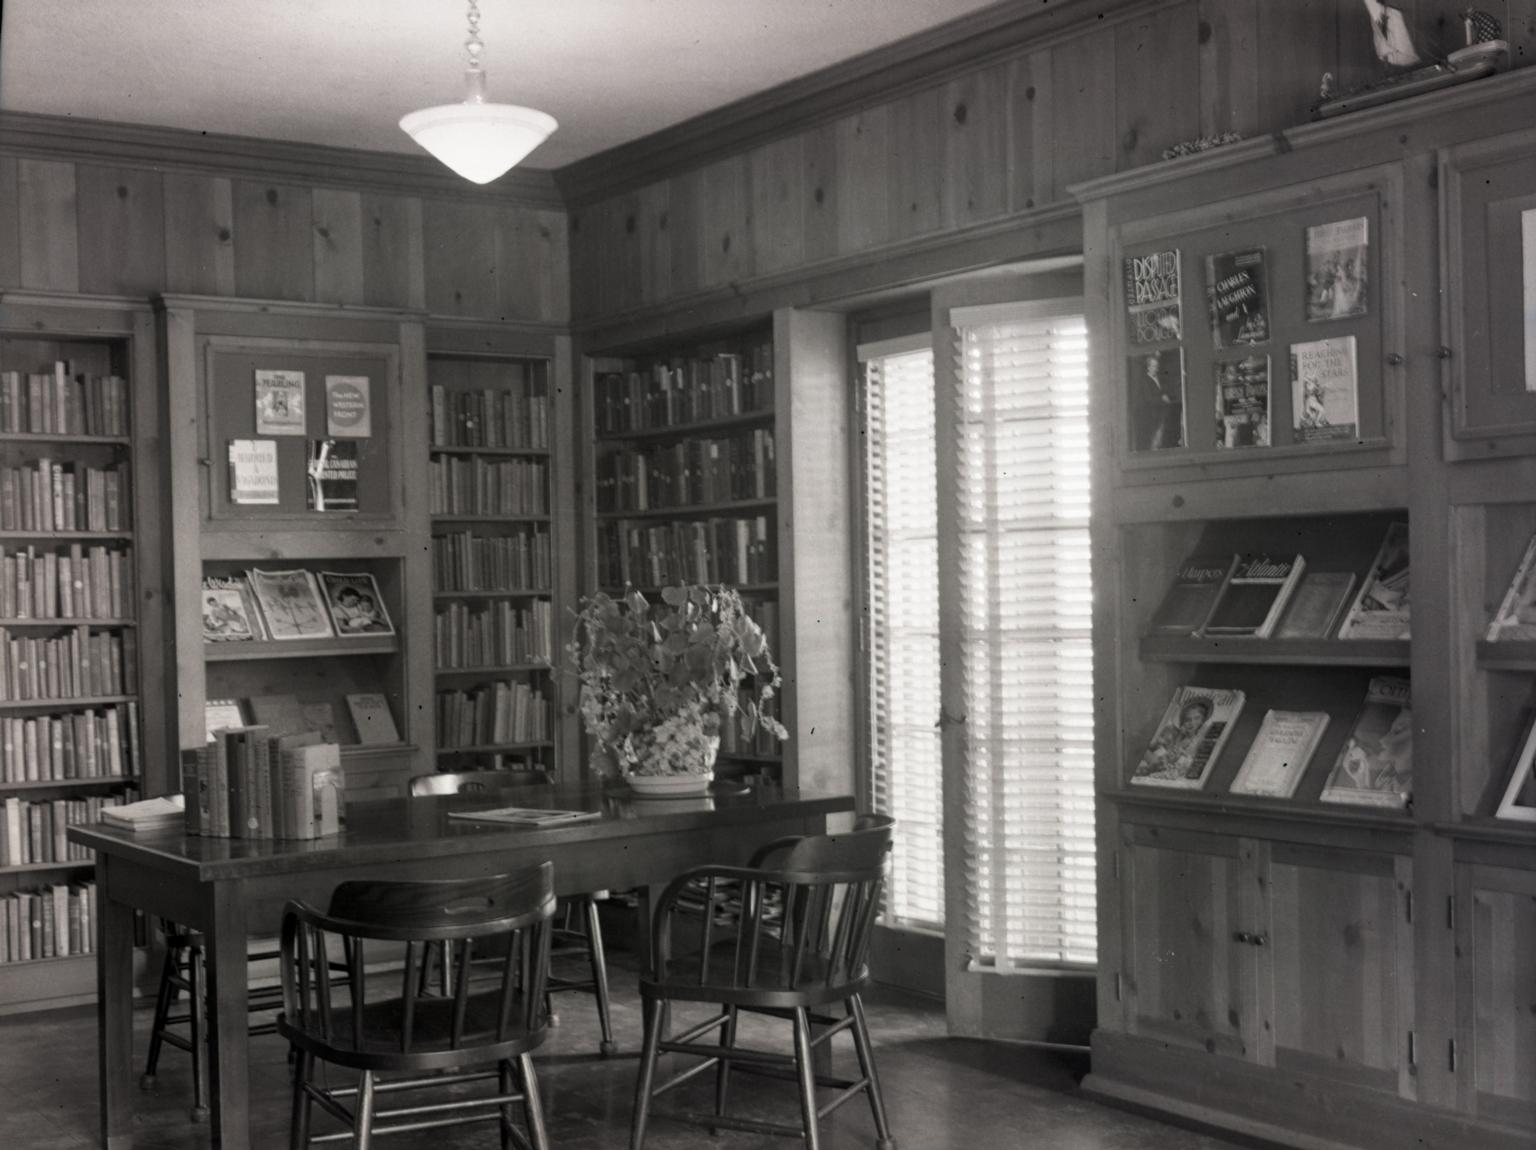 Carpinteria Library